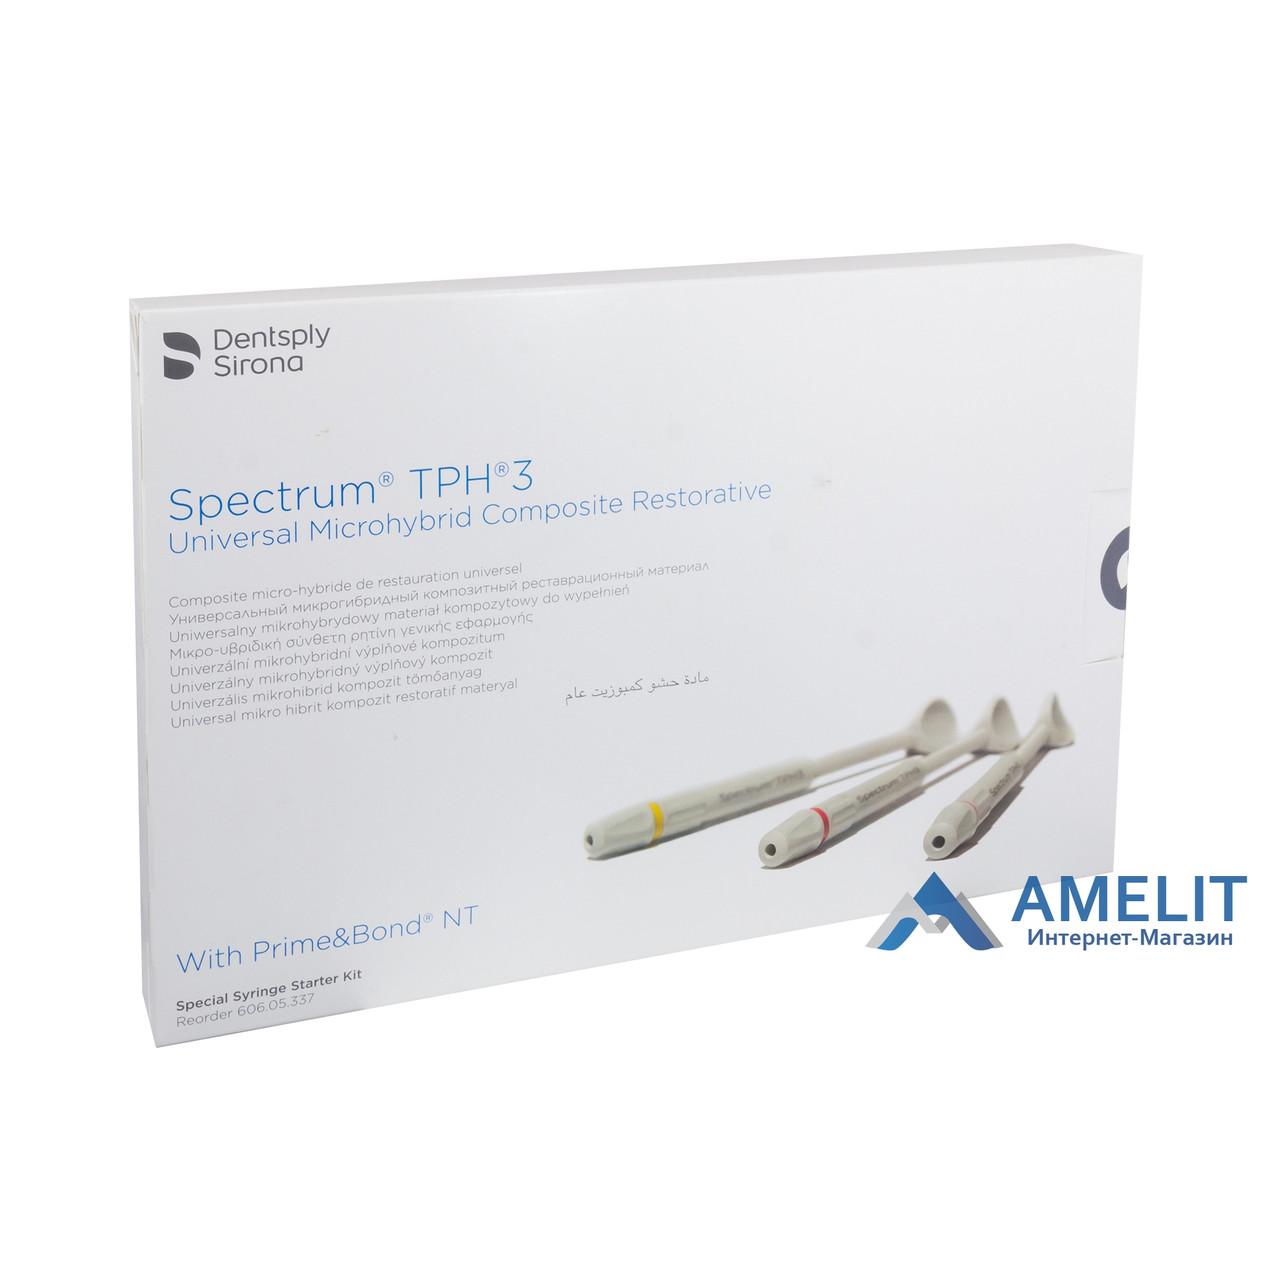 Спектрум TPH3 (Spectrum TPH3, Dentsply Sirona), набор